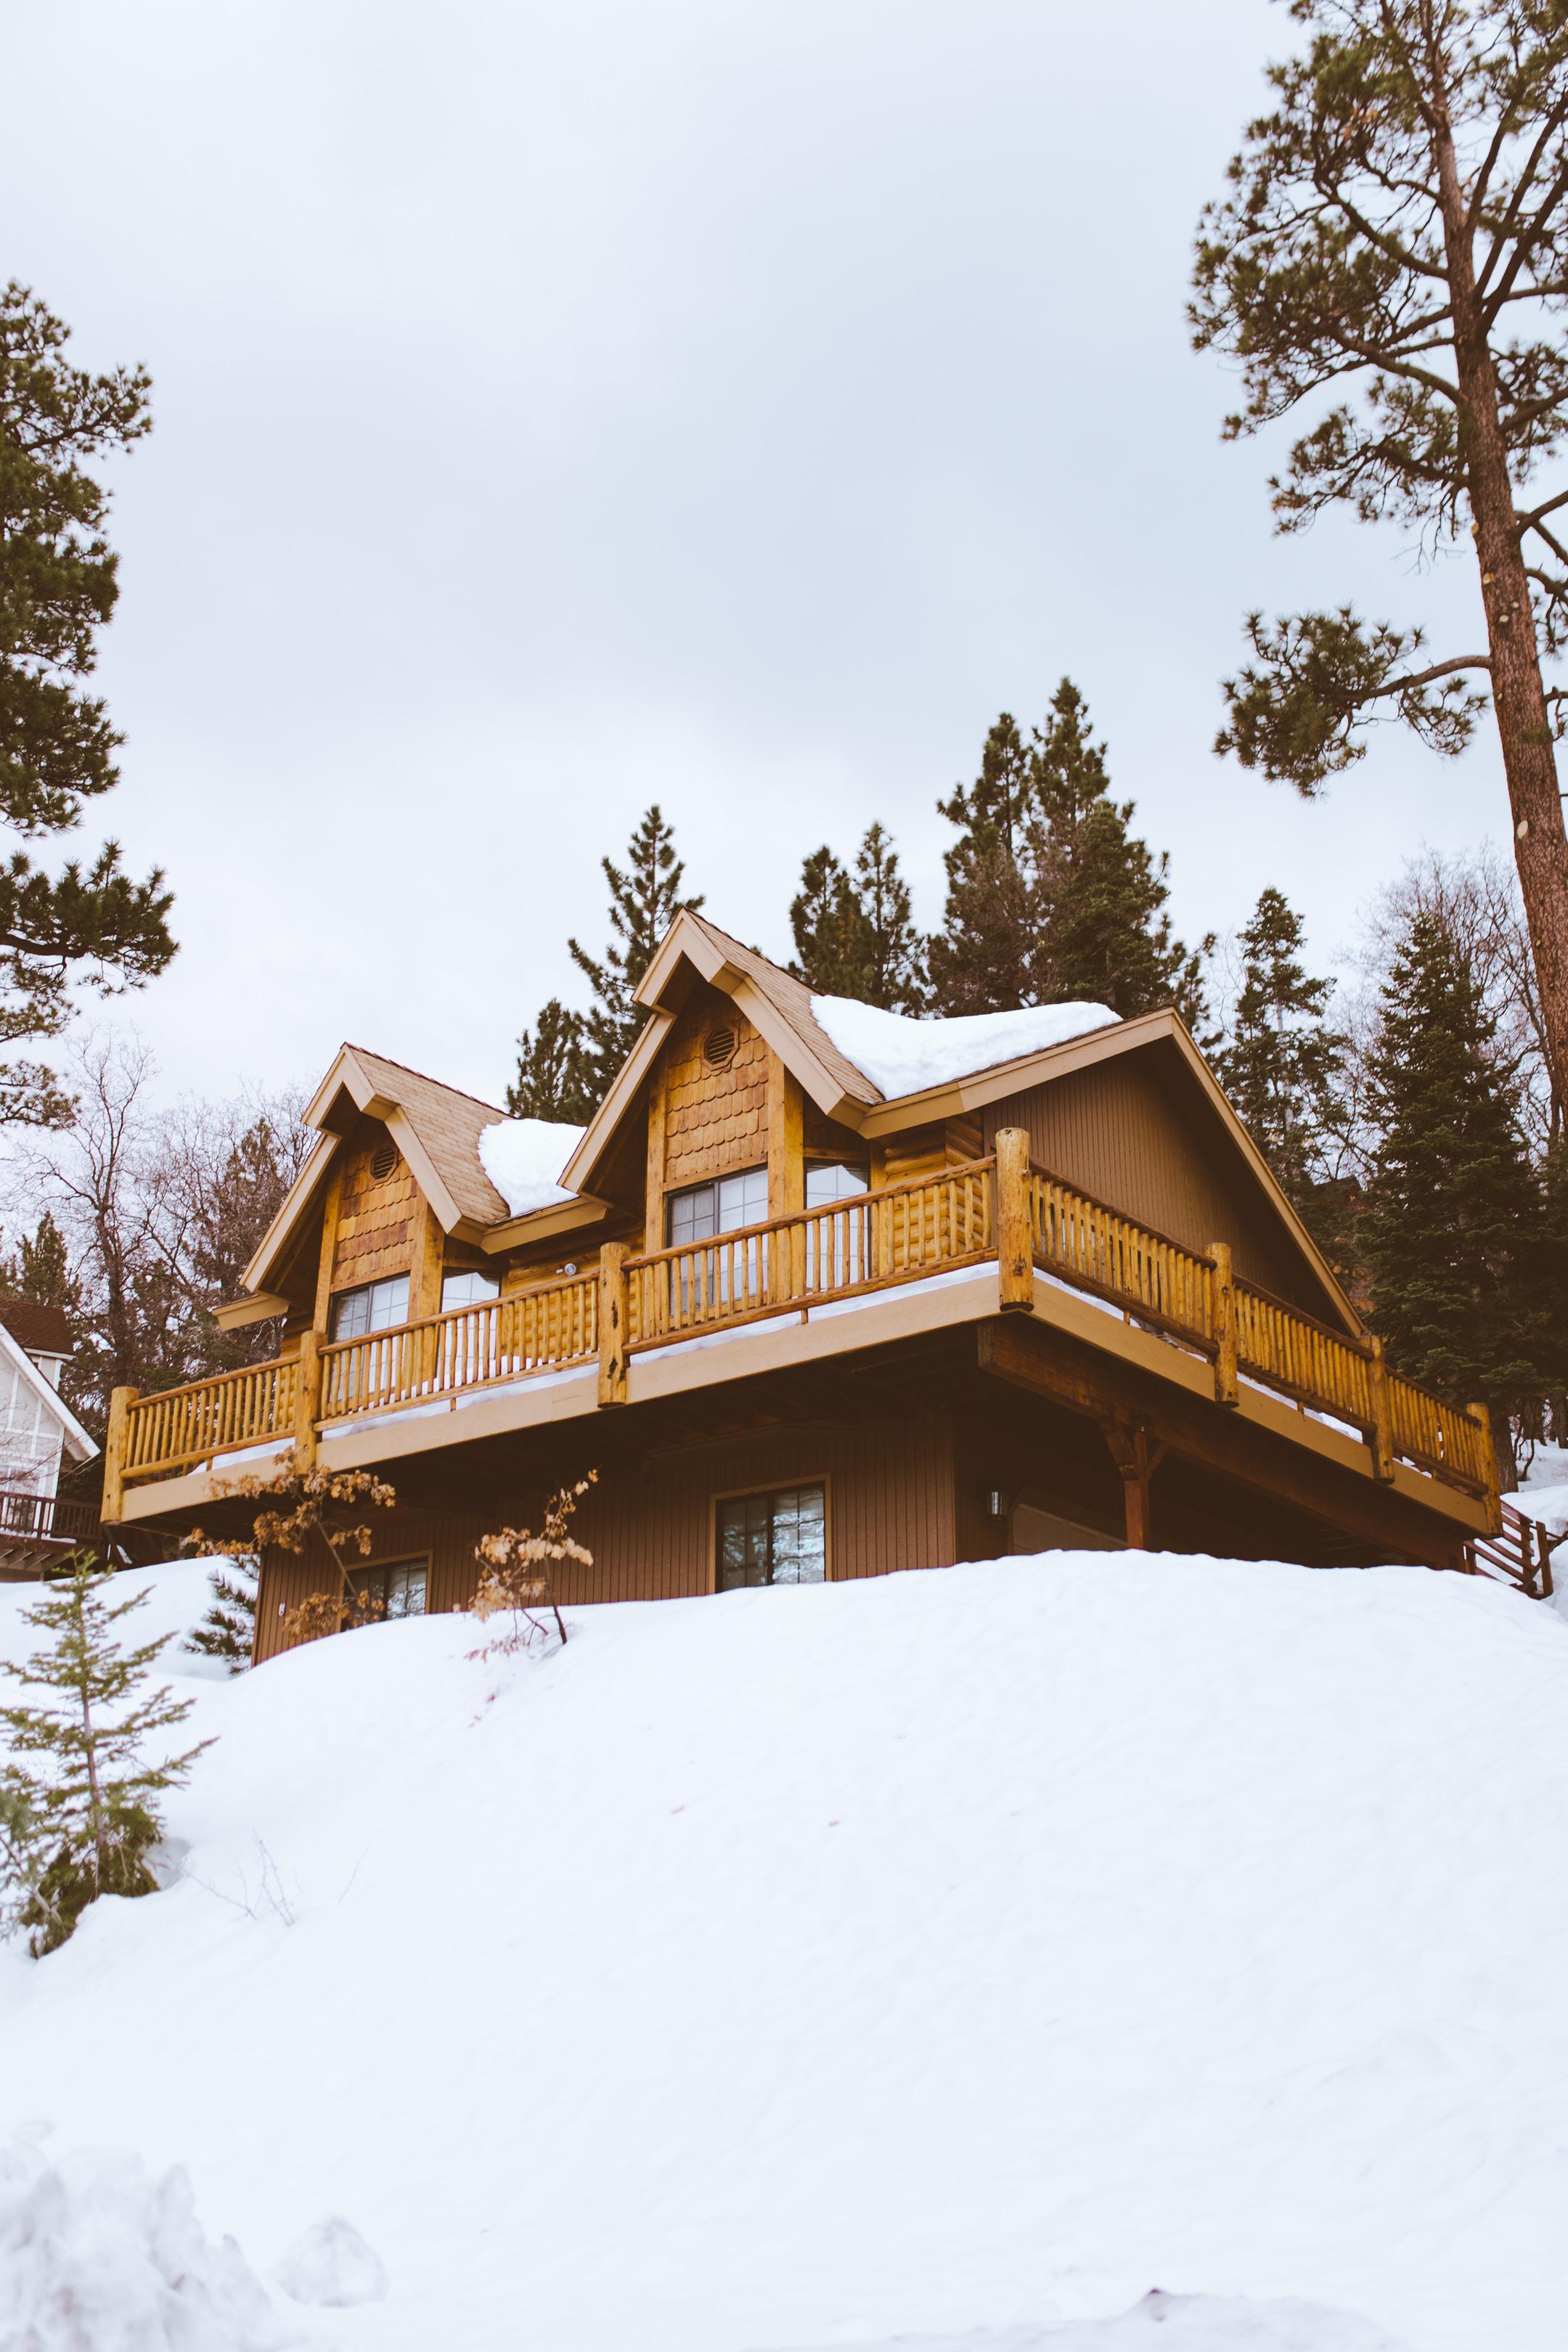 California ski resort